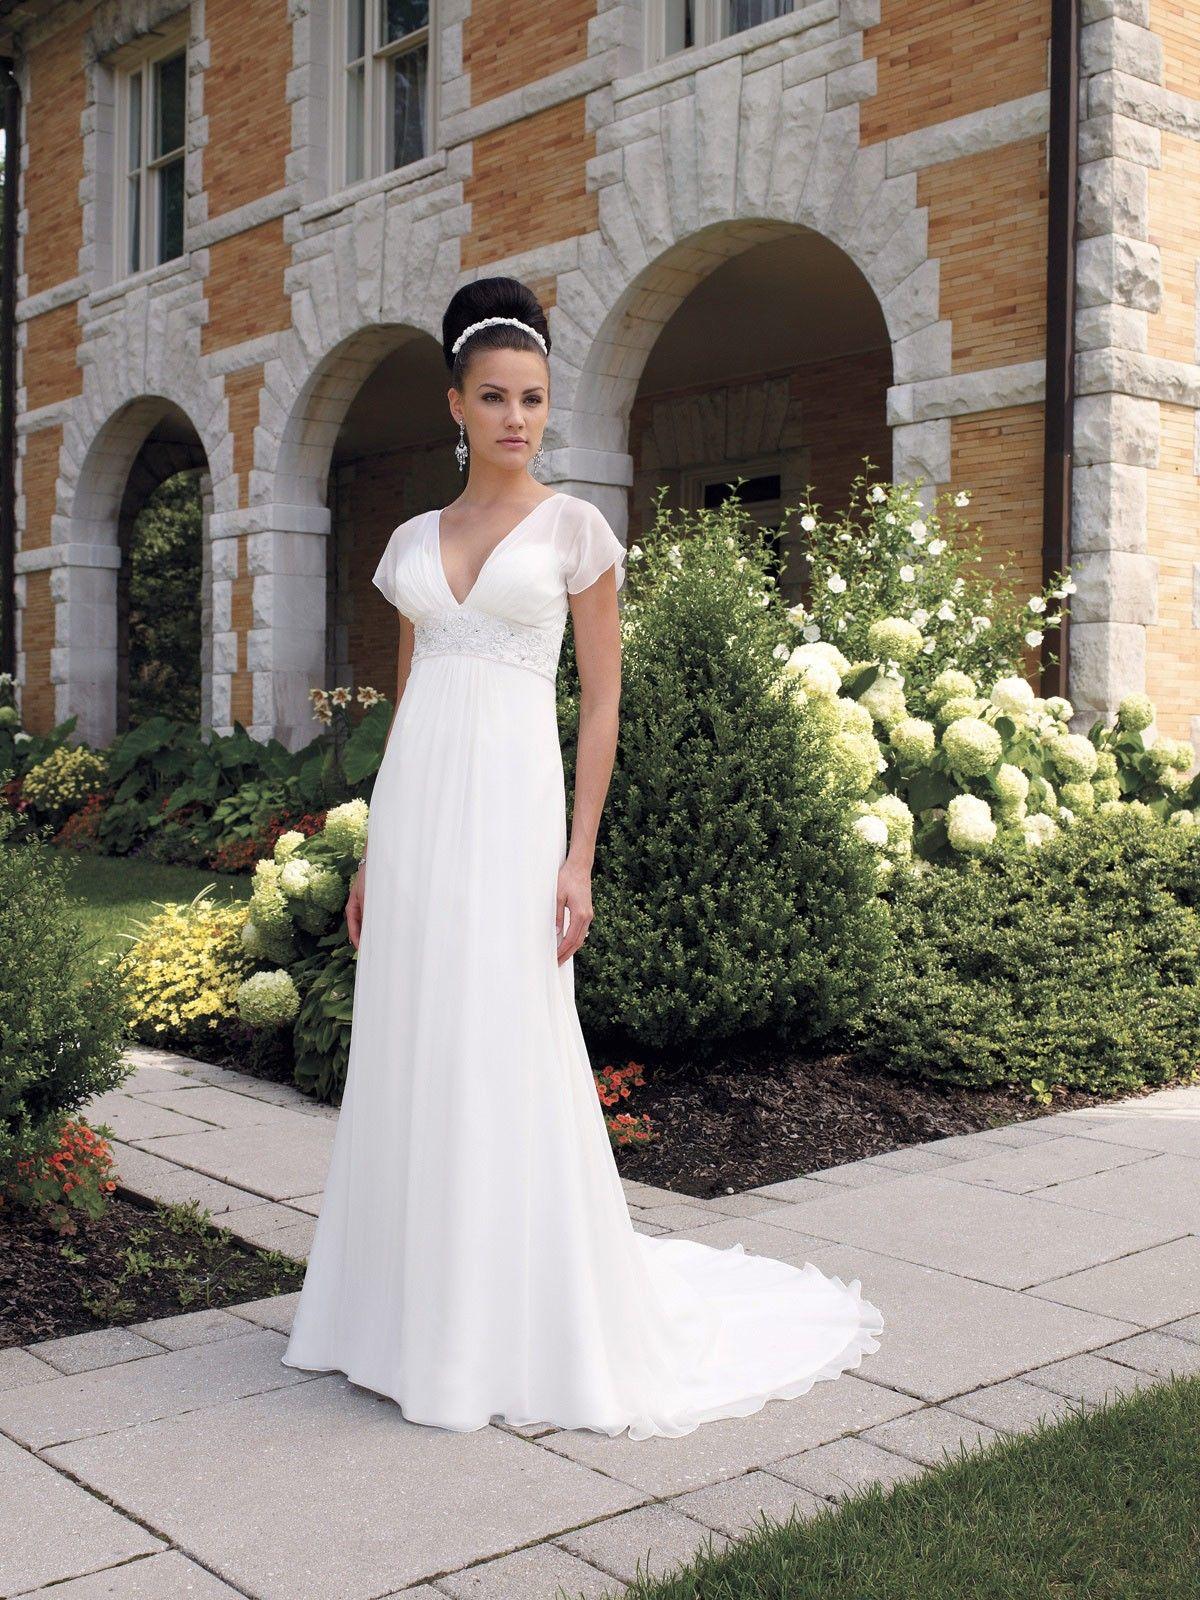 Style Mbd7506 Wedding Dresses 2011 Mybridaldress Com Short Sleeve Wedding Dress Wedding Dresses Older Bride Wedding Dress [ 1600 x 1200 Pixel ]